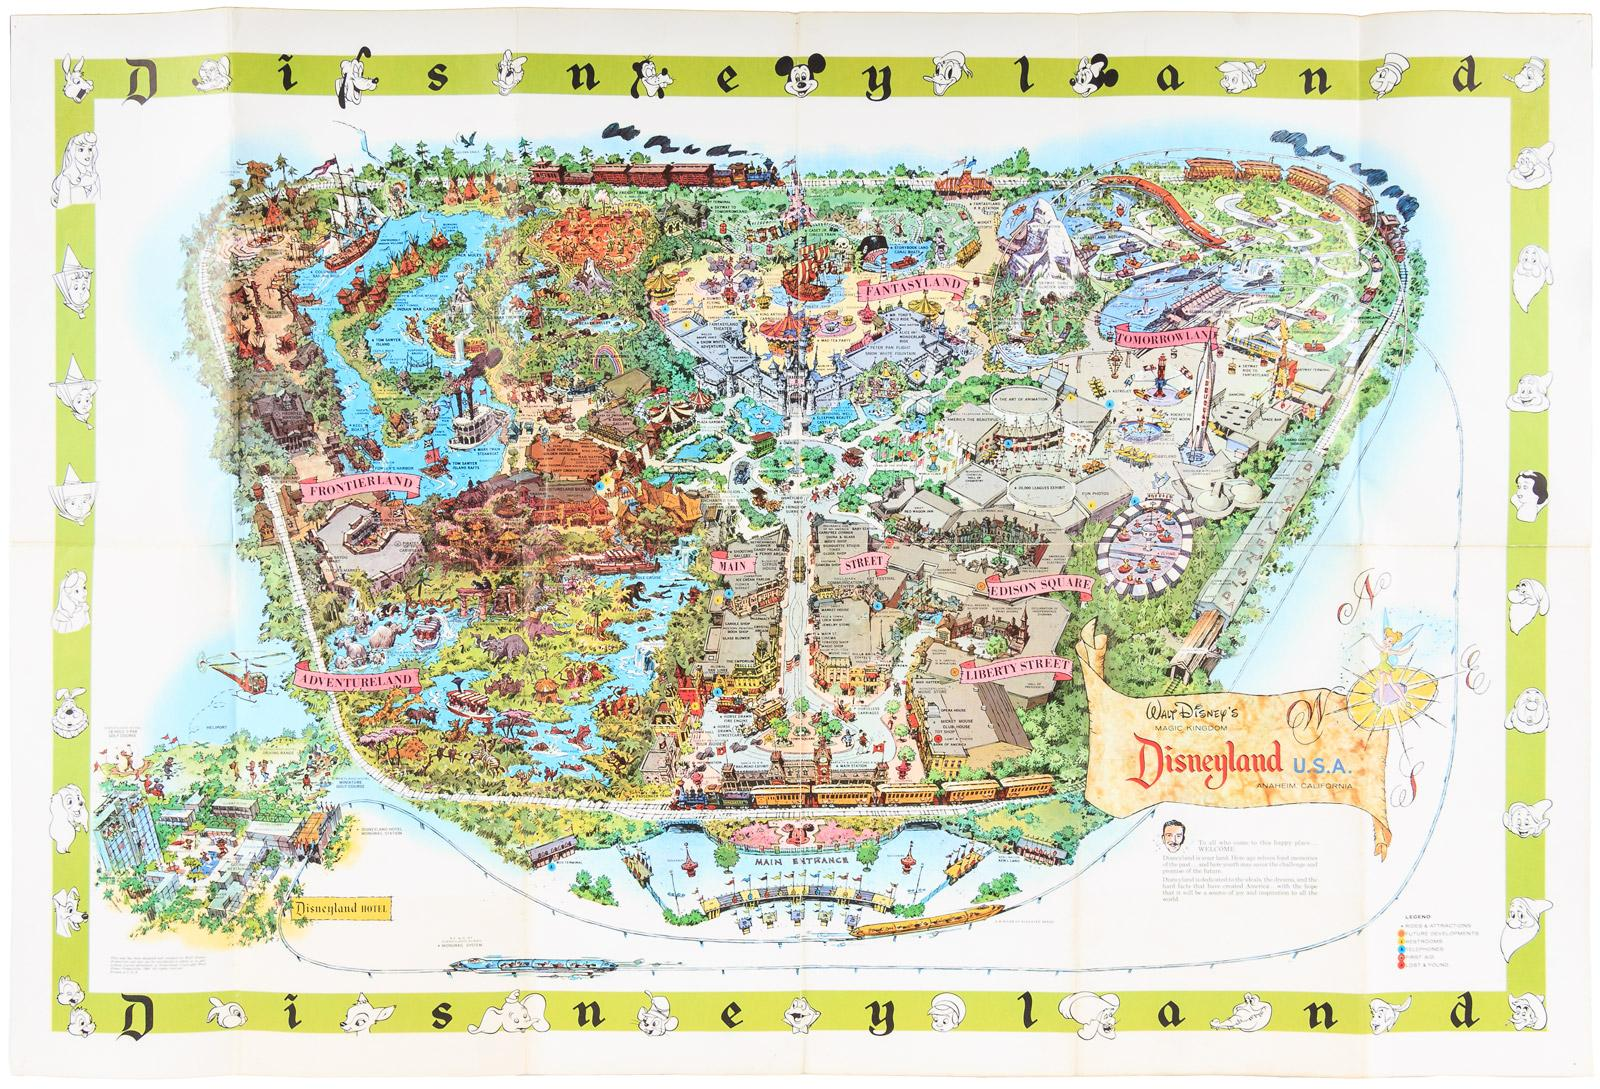 Disneyland Usa Map on